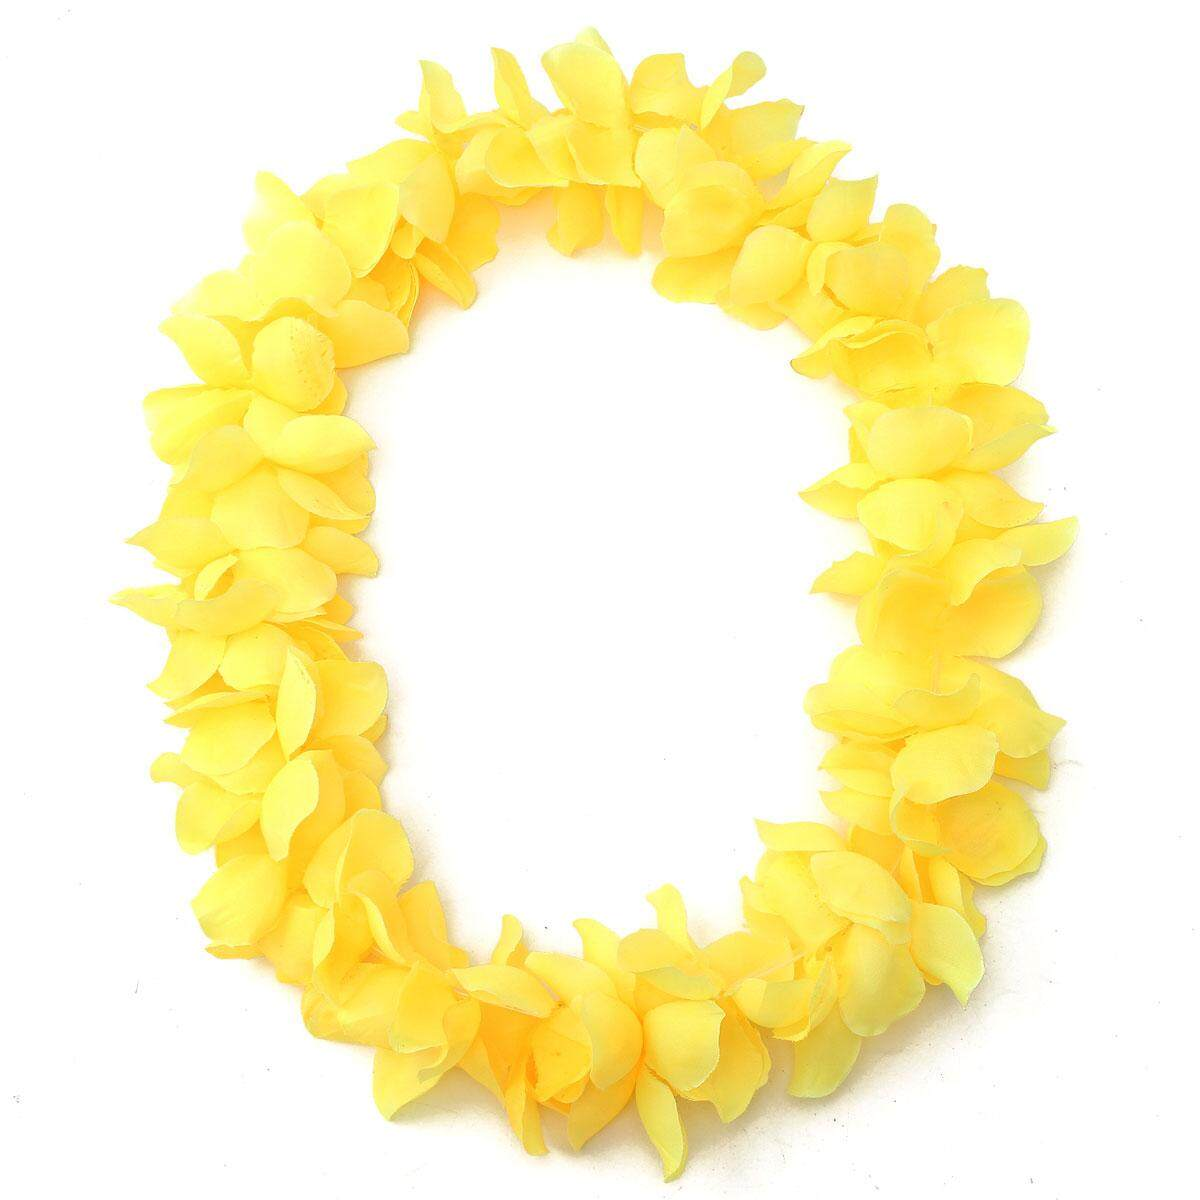 Hawaiian flower garland amazon flowers healthy hawaiian flower leis garland necklace fancy dress party hawaii beach fun sell est hawaiian bunga garland best quality izmirmasajfo